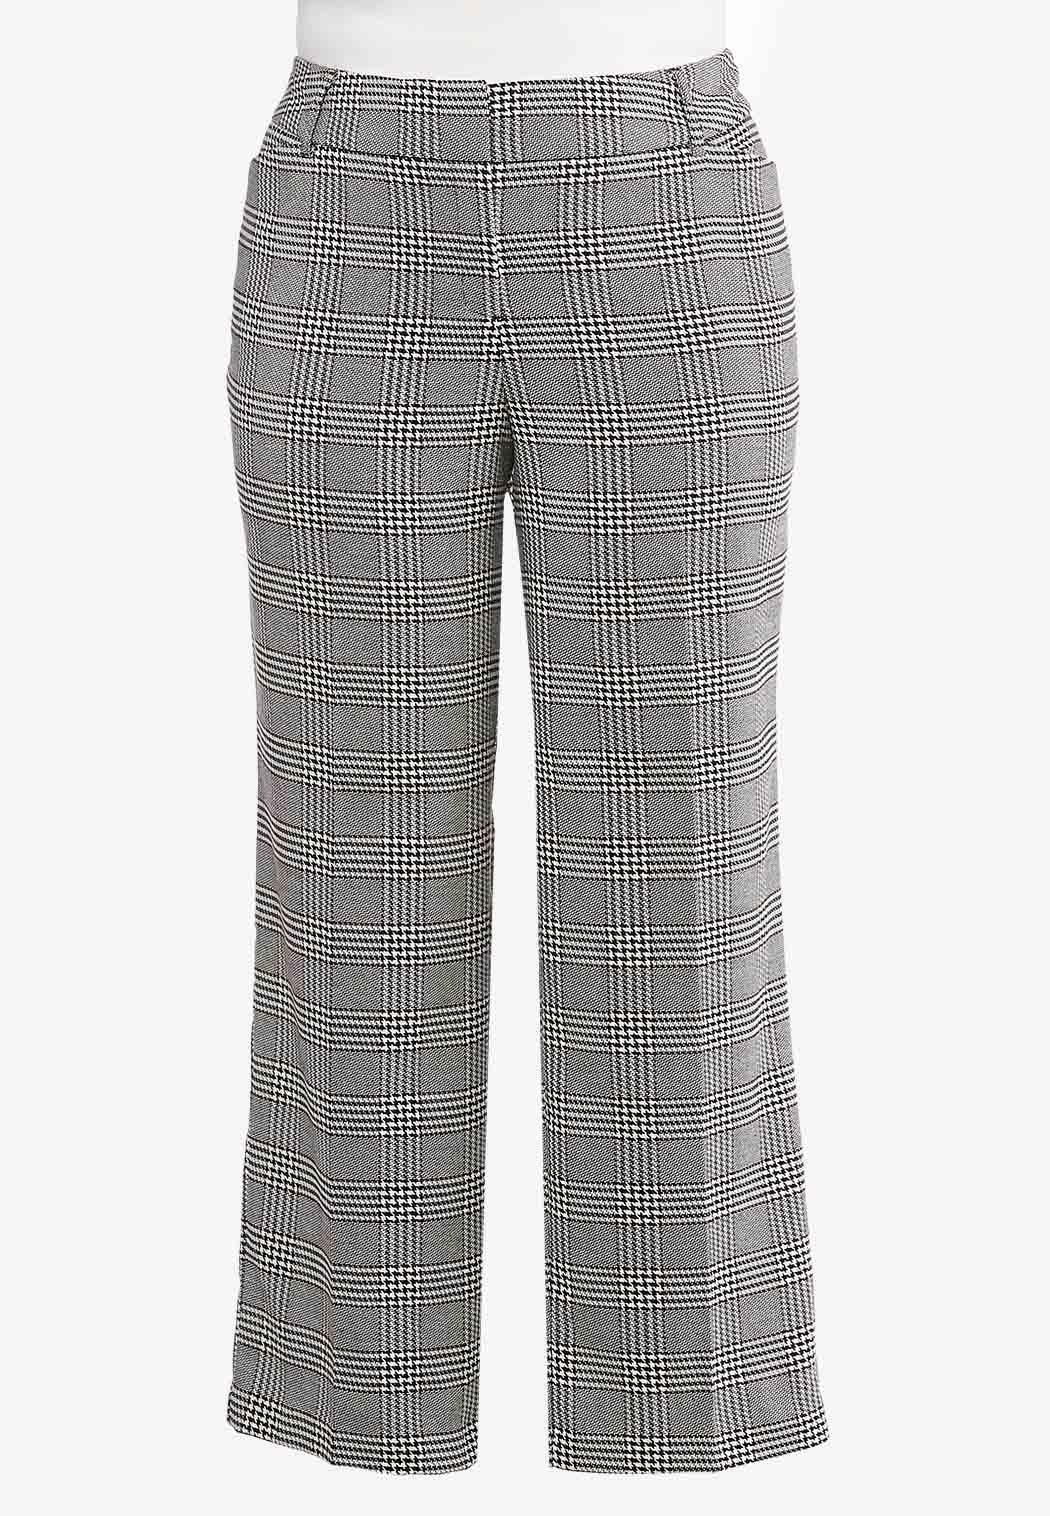 Plus Size Plaid Trouser Pants Pants Cato Fashions - What is a business invoice plus size clothing stores online